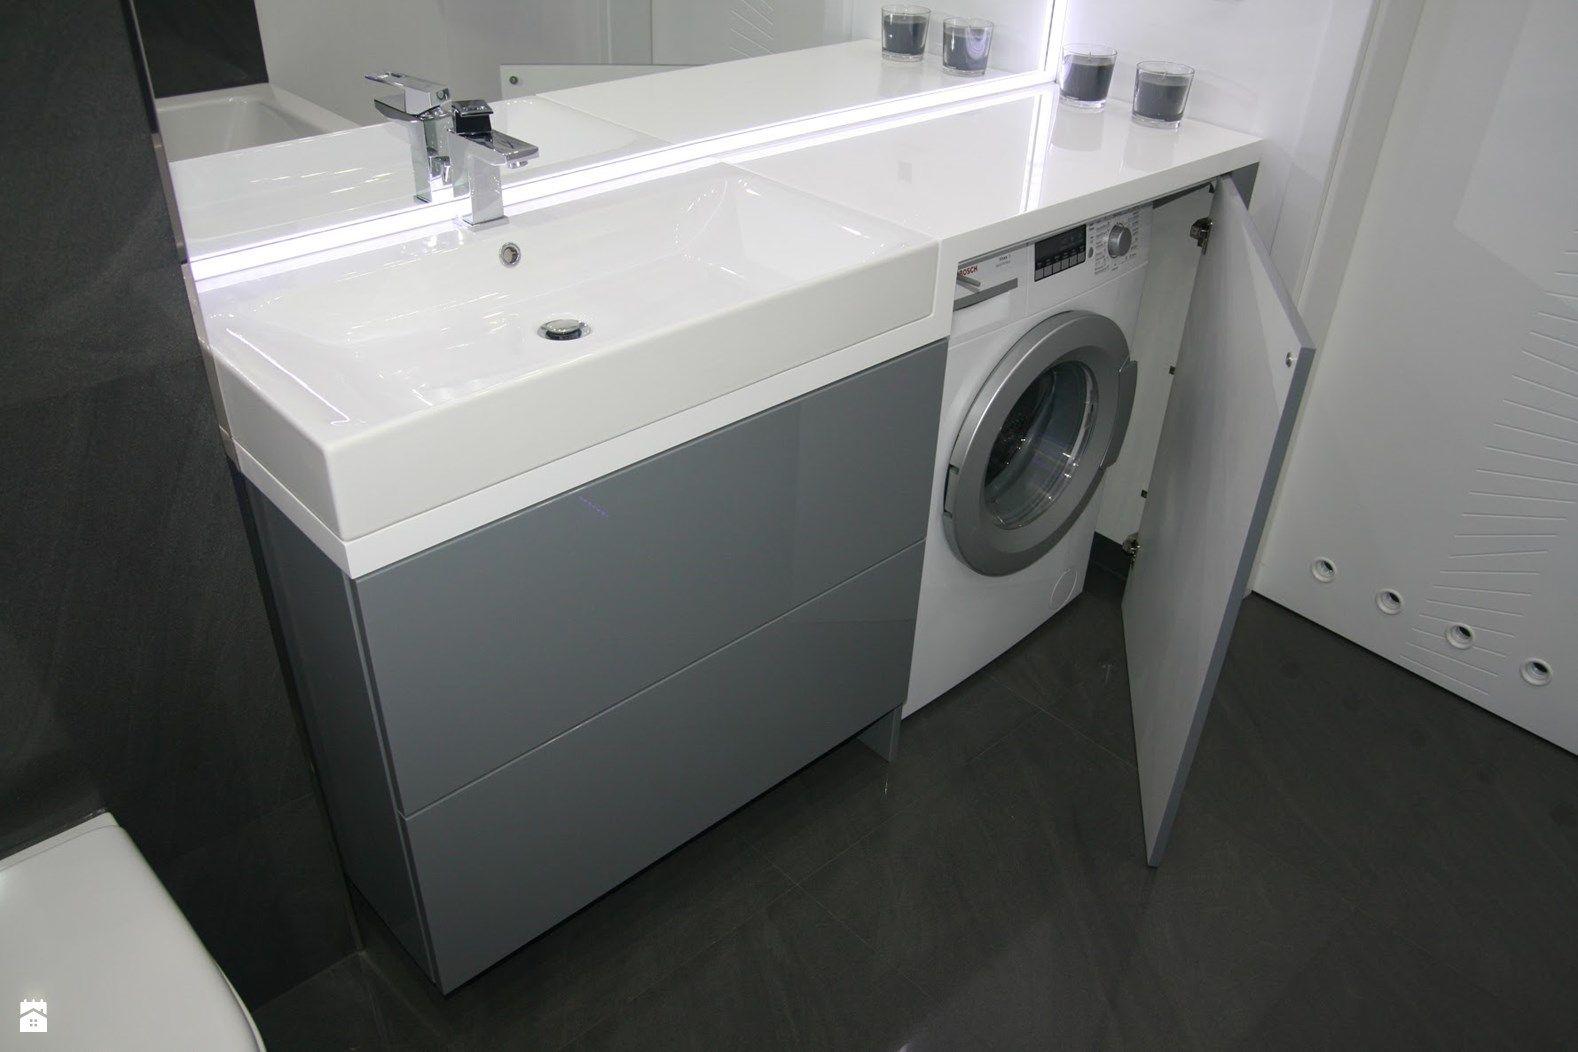 20 Waschmaschinen Verstecke Ideen   waschmaschine, badezimmer ...